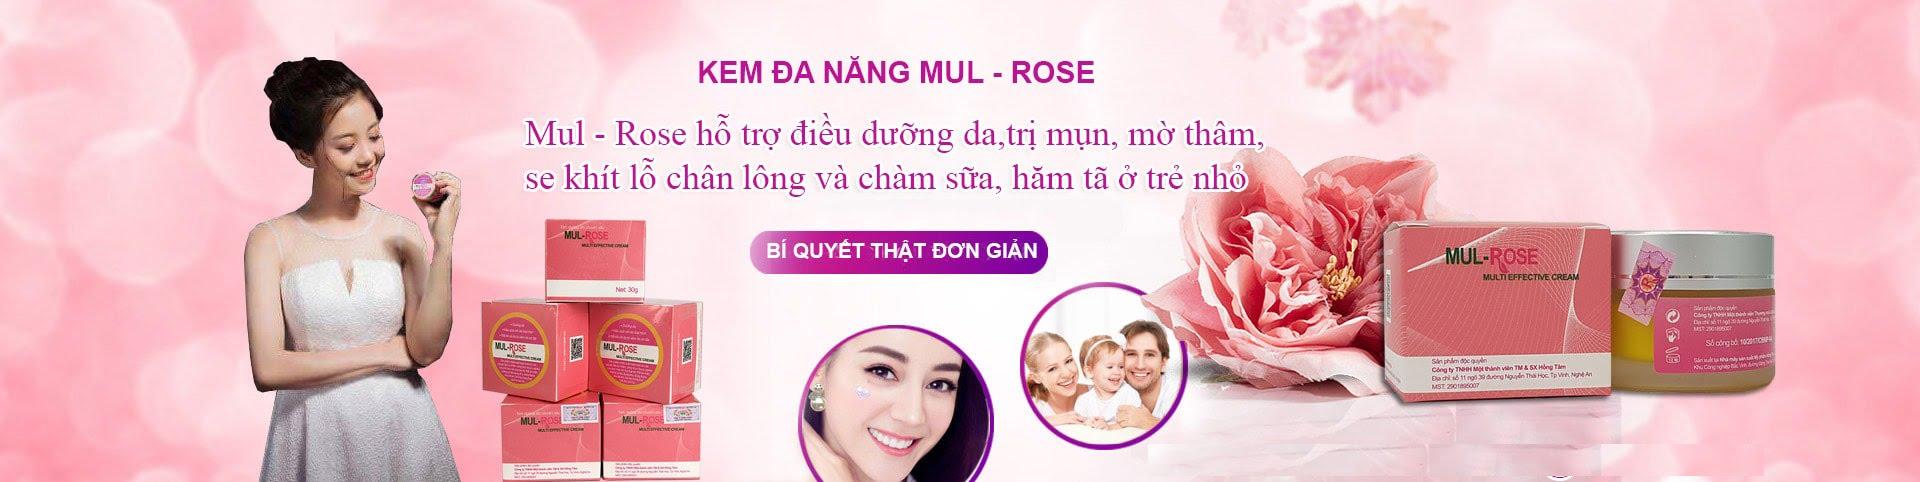 Kem Mul Rose